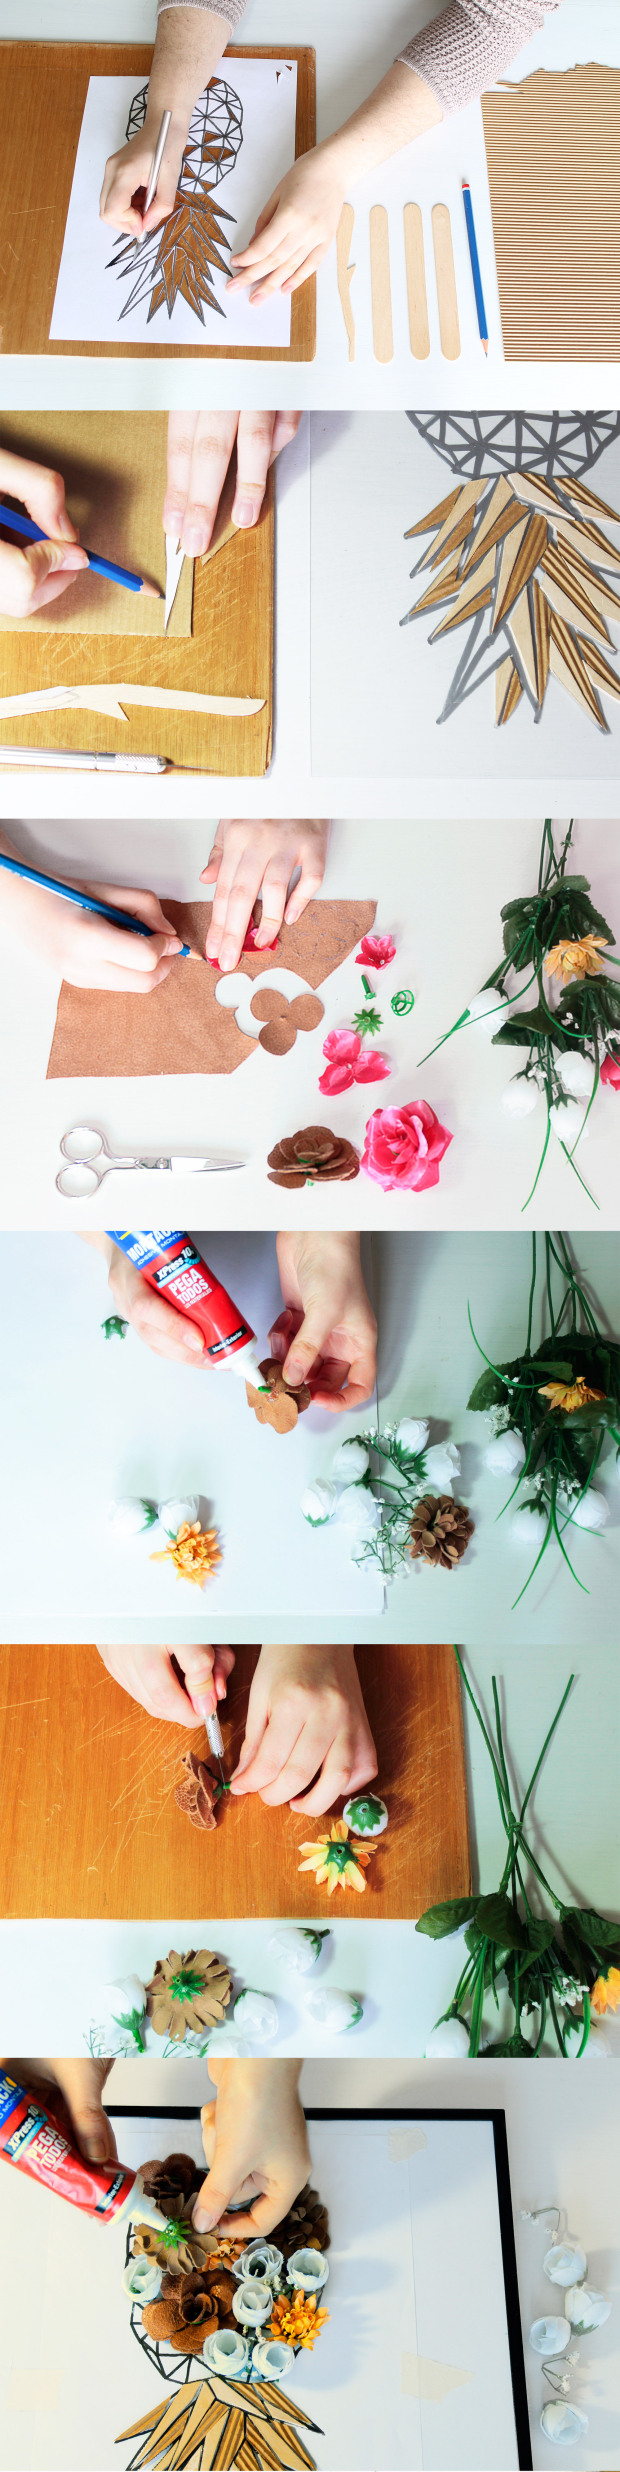 como hacer piña decorativa con flores.jpg